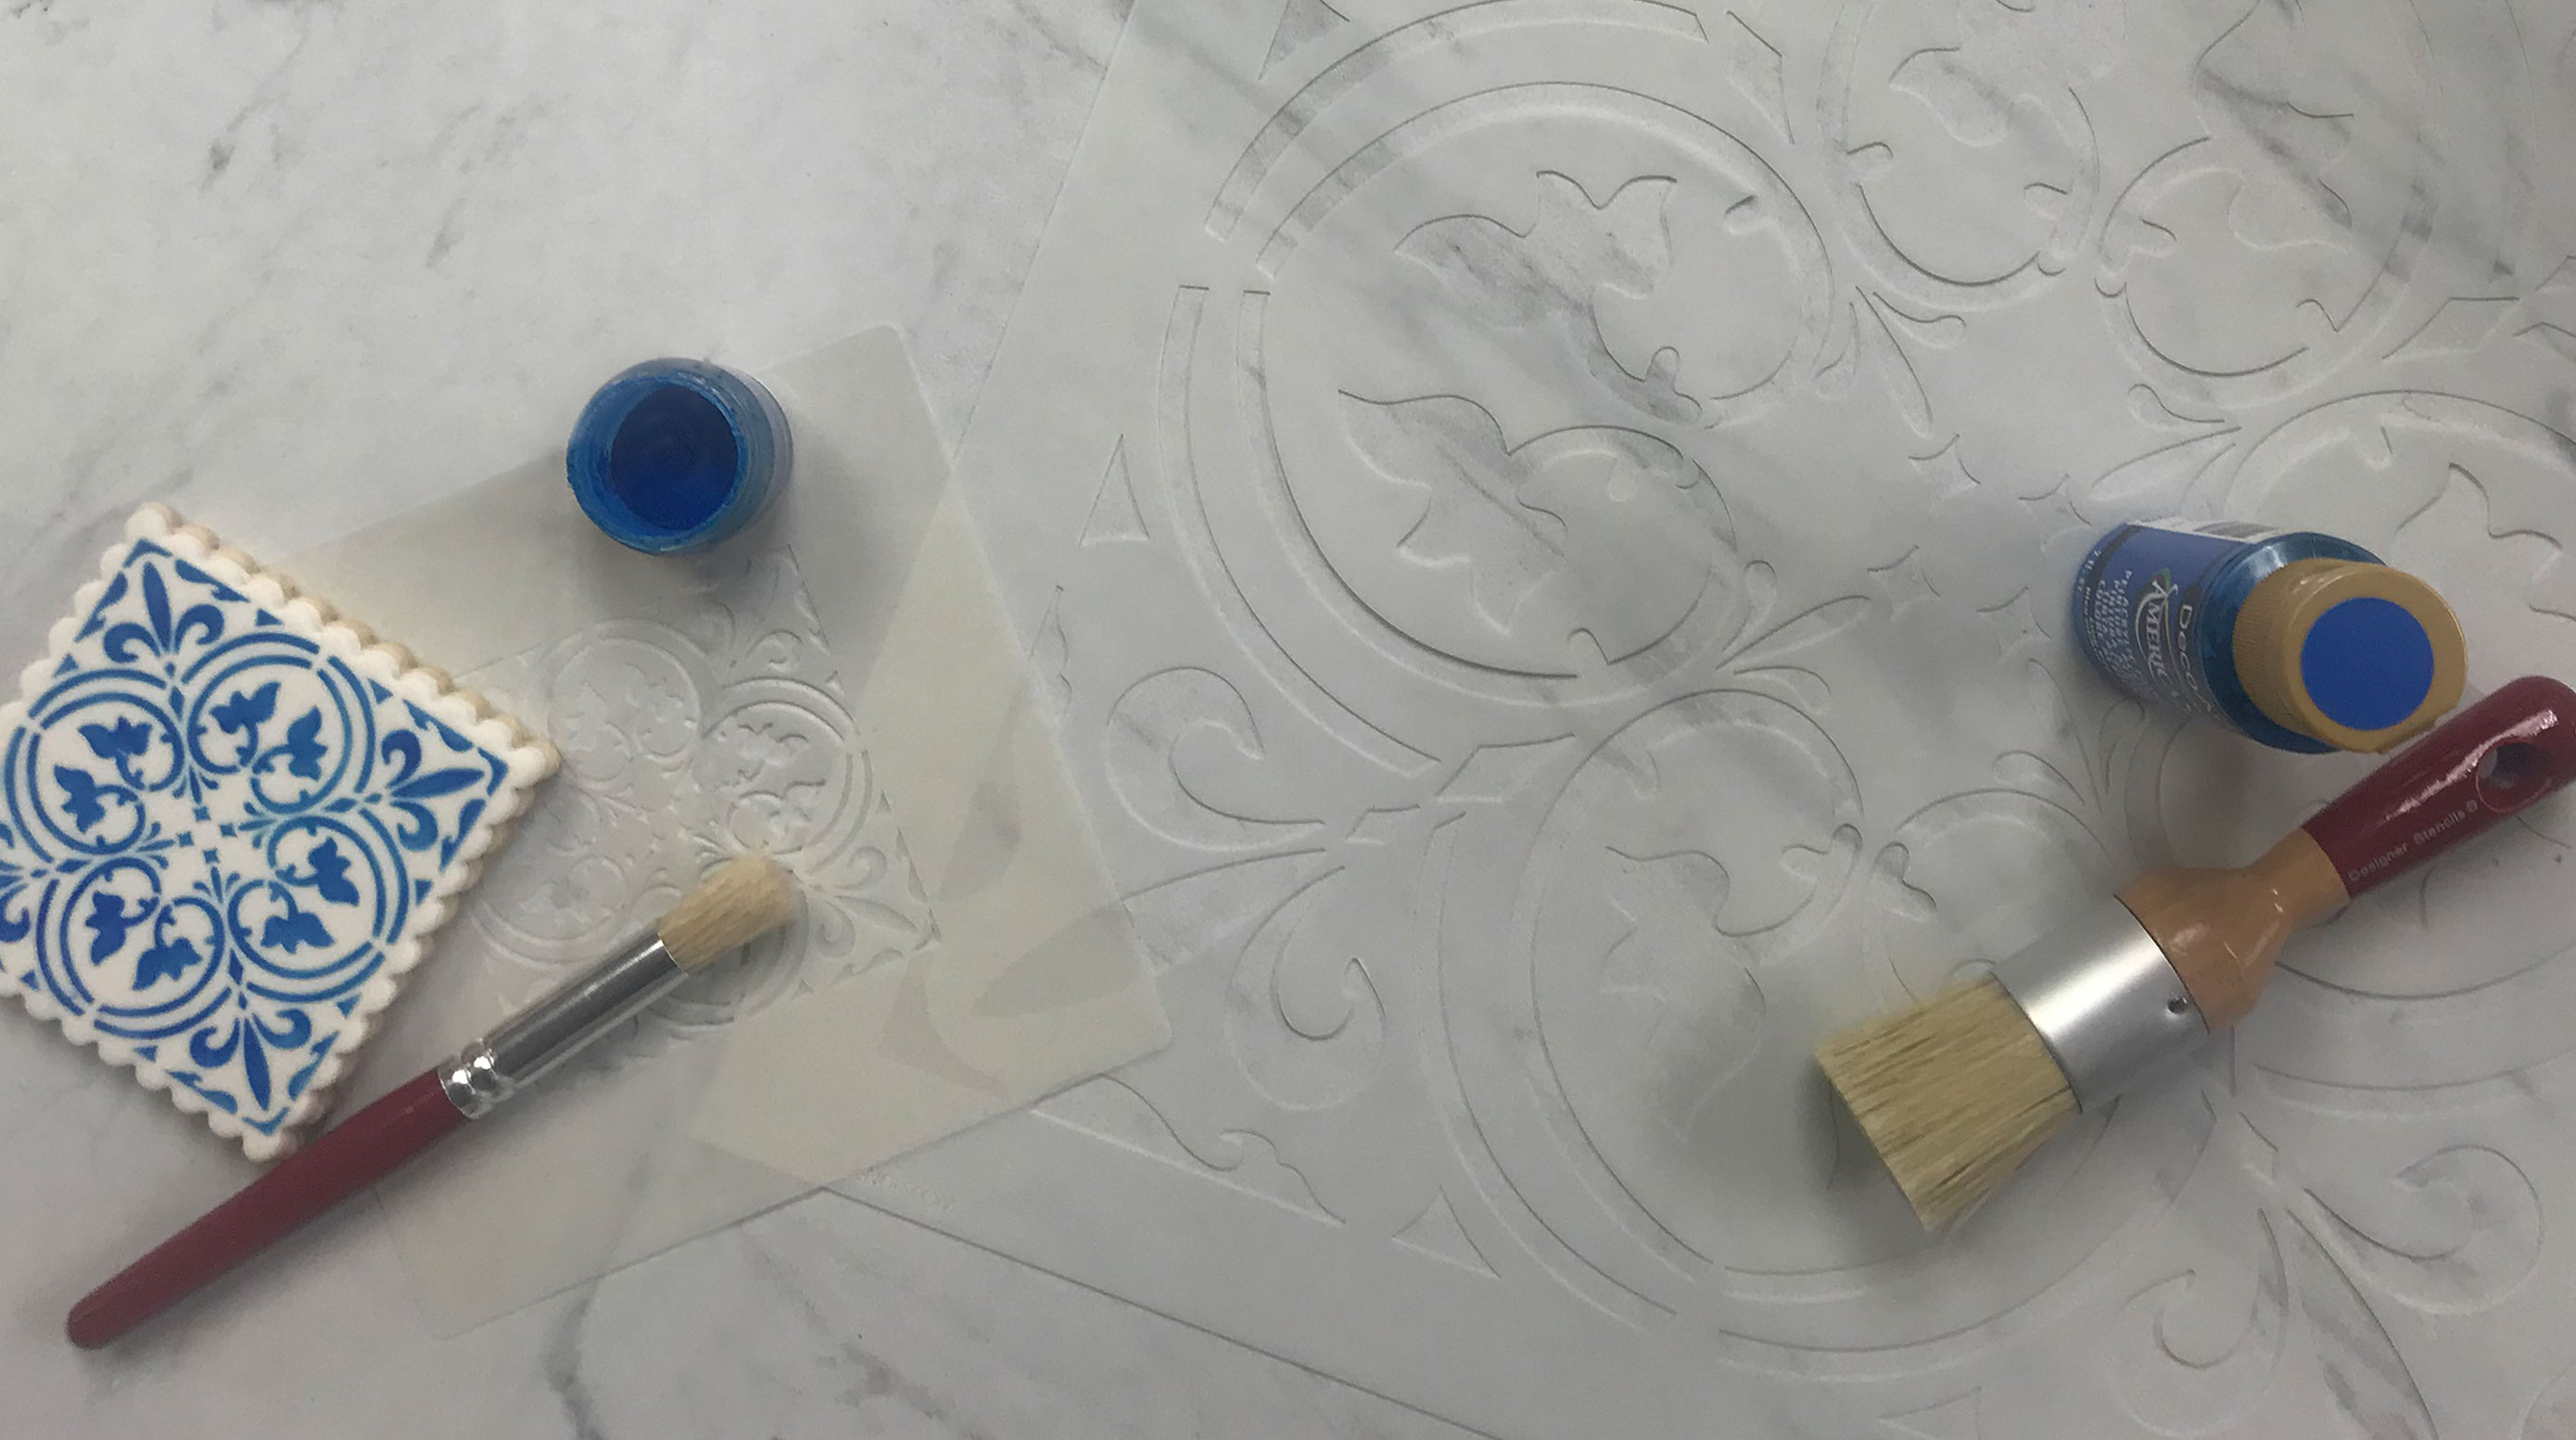 Design Like a Pro with Designer Stencils